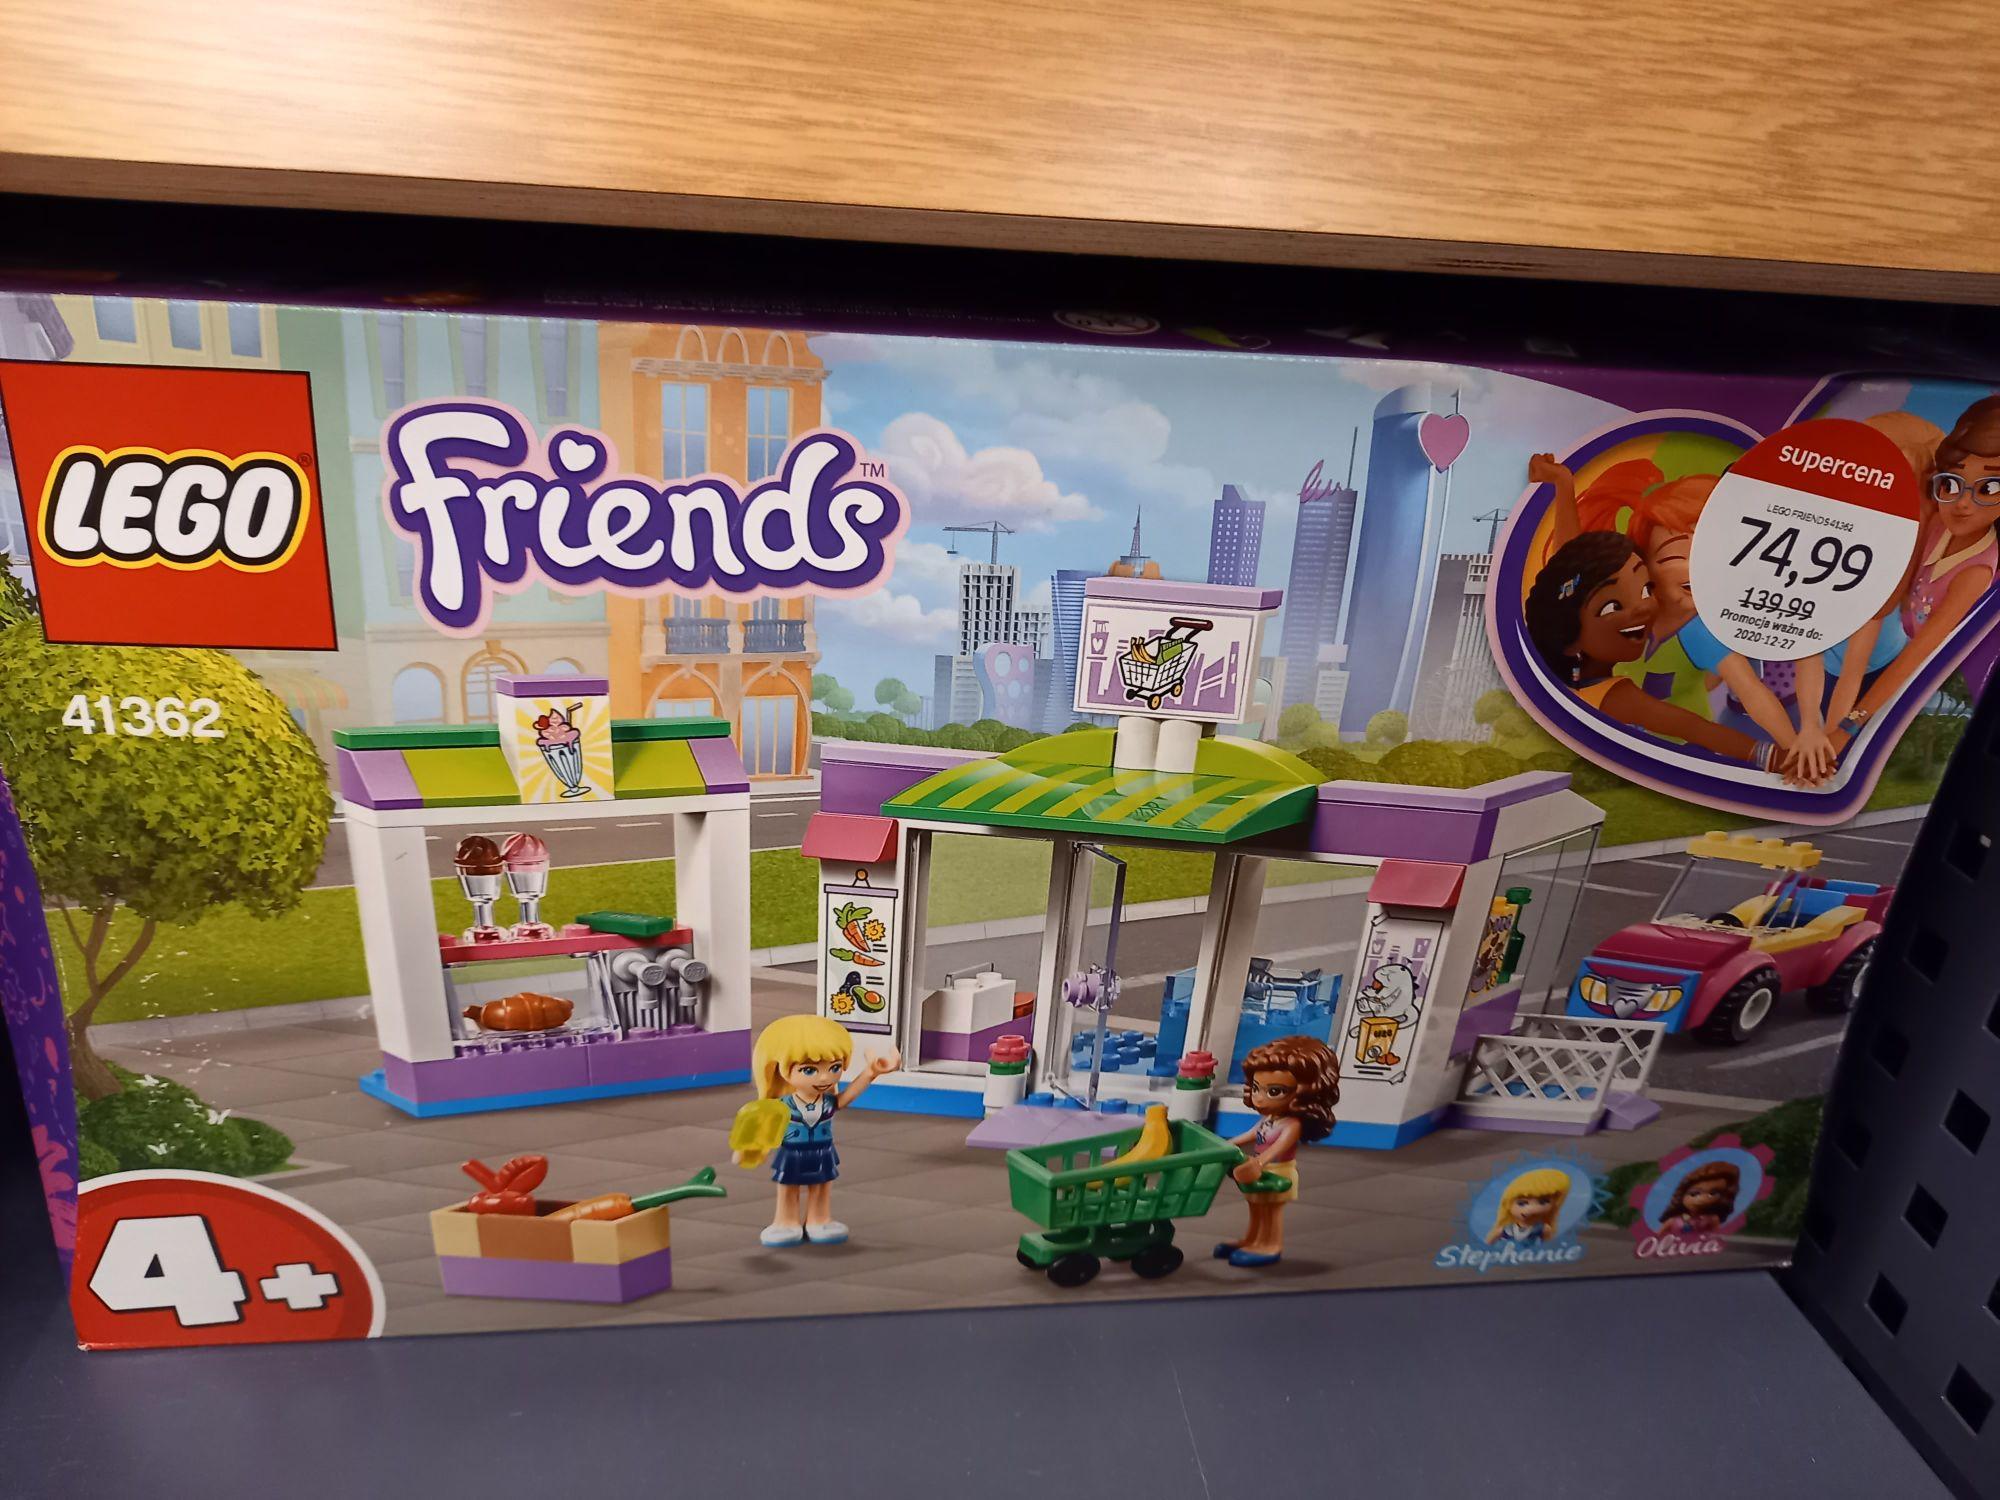 Lego friends 41362 Empik